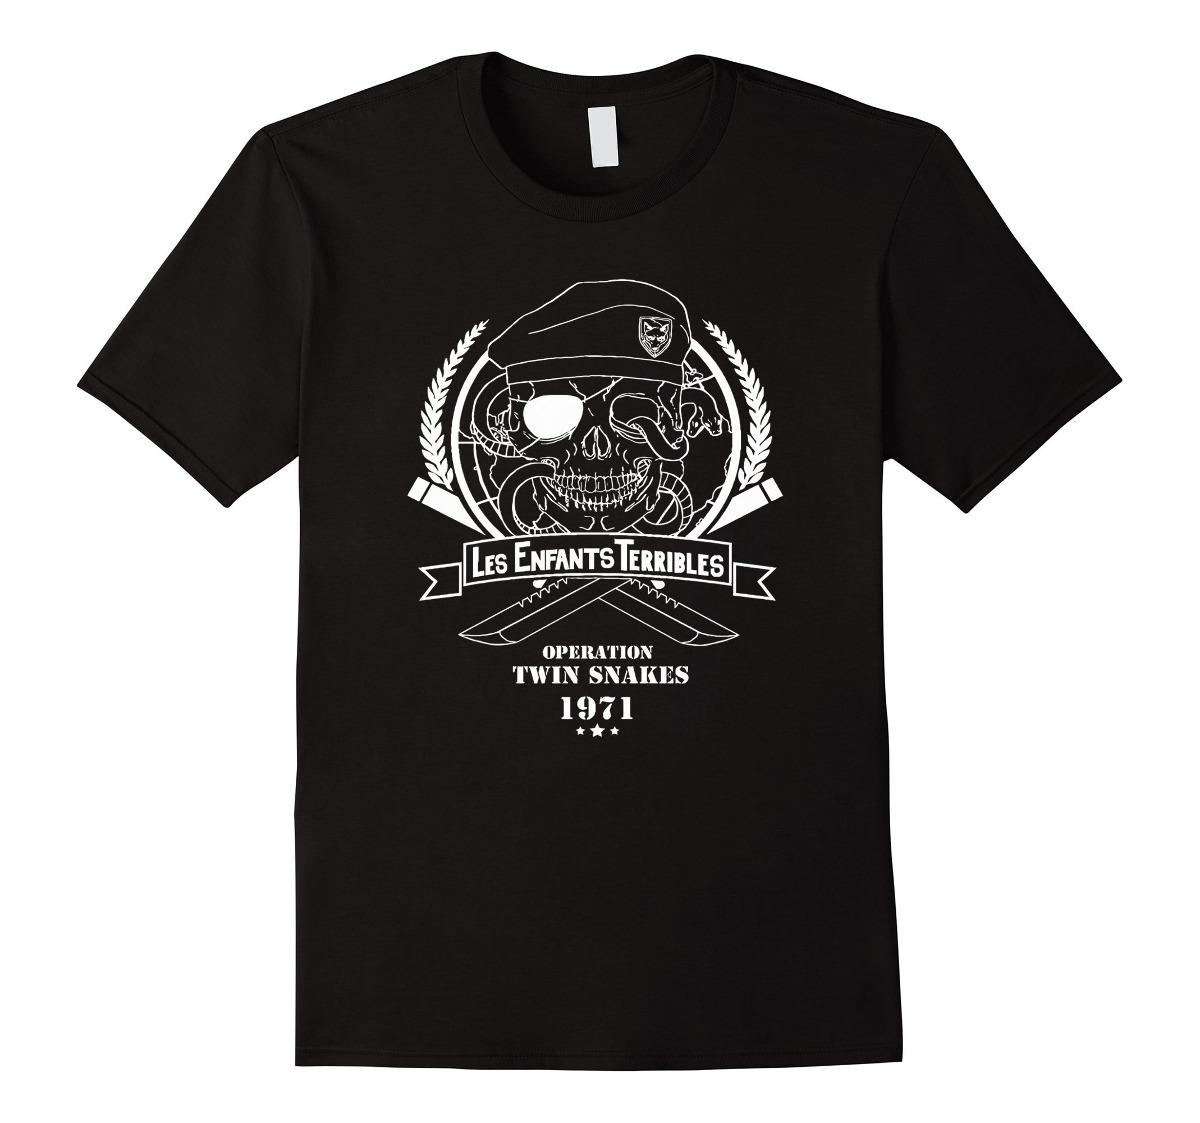 1dd552024f9d2 Camiseta Ps Para Hombre - Camiseta Metal Gear Solid De Le - U S 68 ...